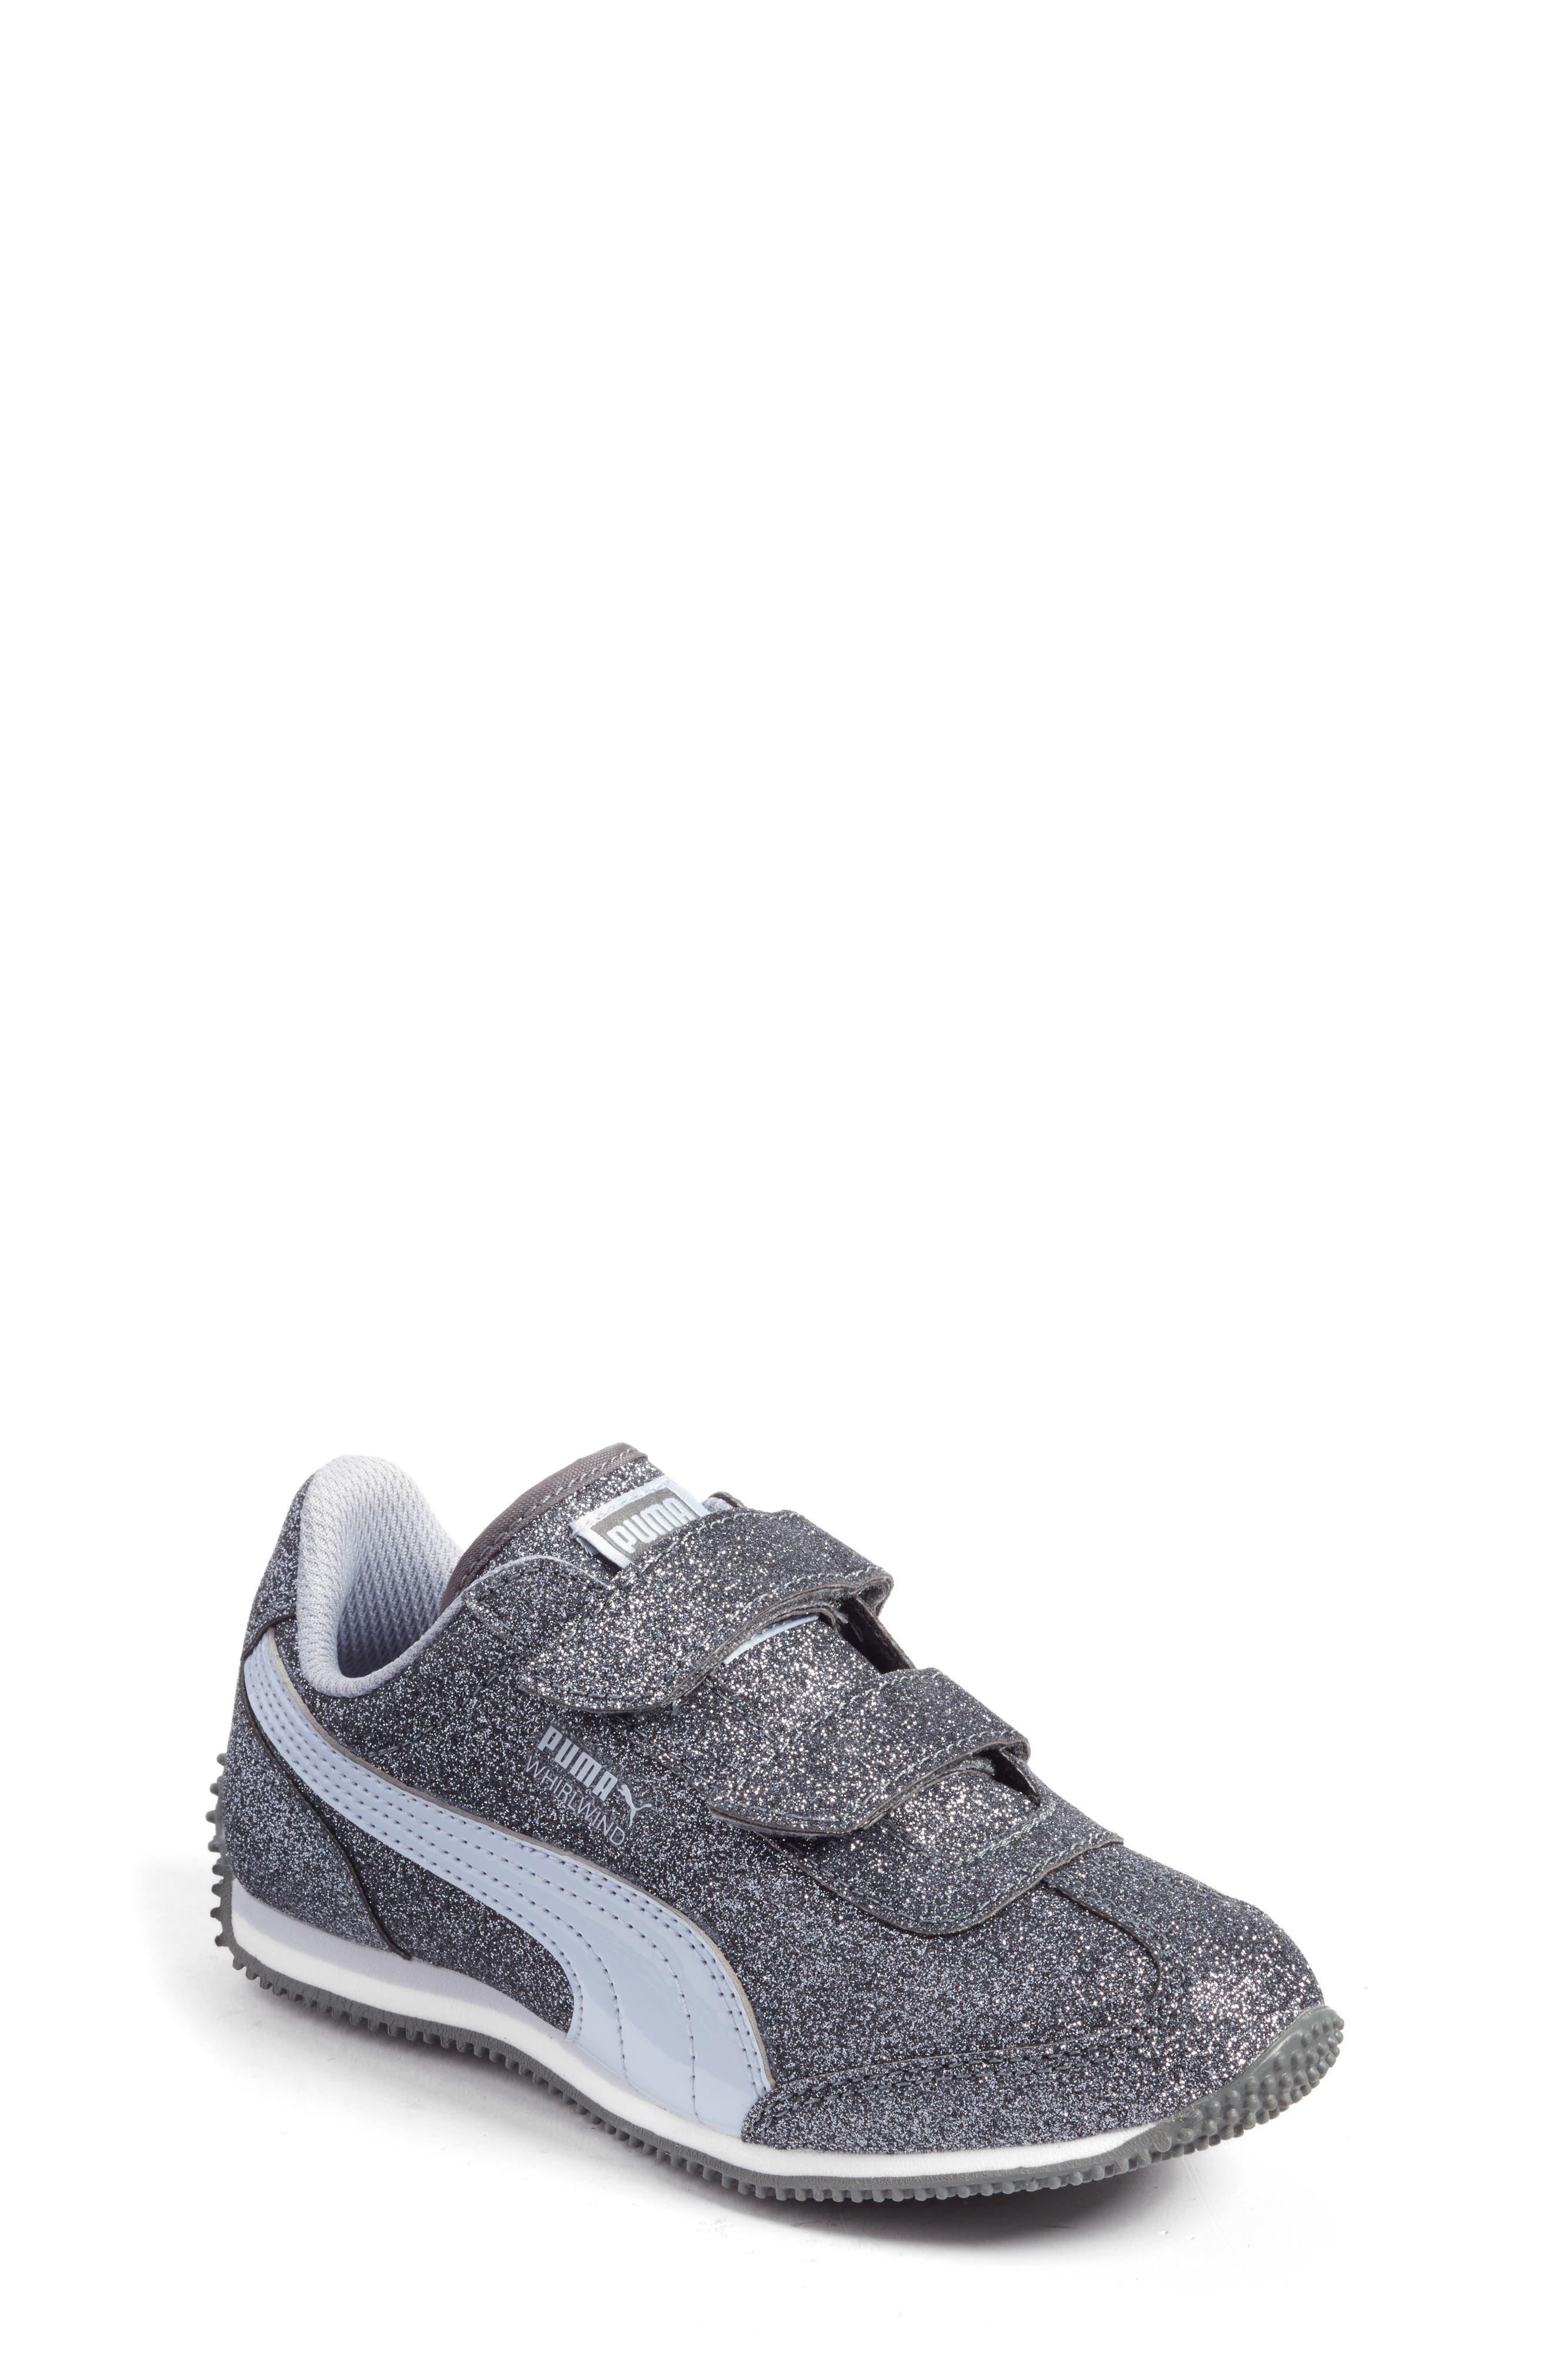 PUMA Whirlwind Glitz Sneaker (Baby, Walker & Toddler)